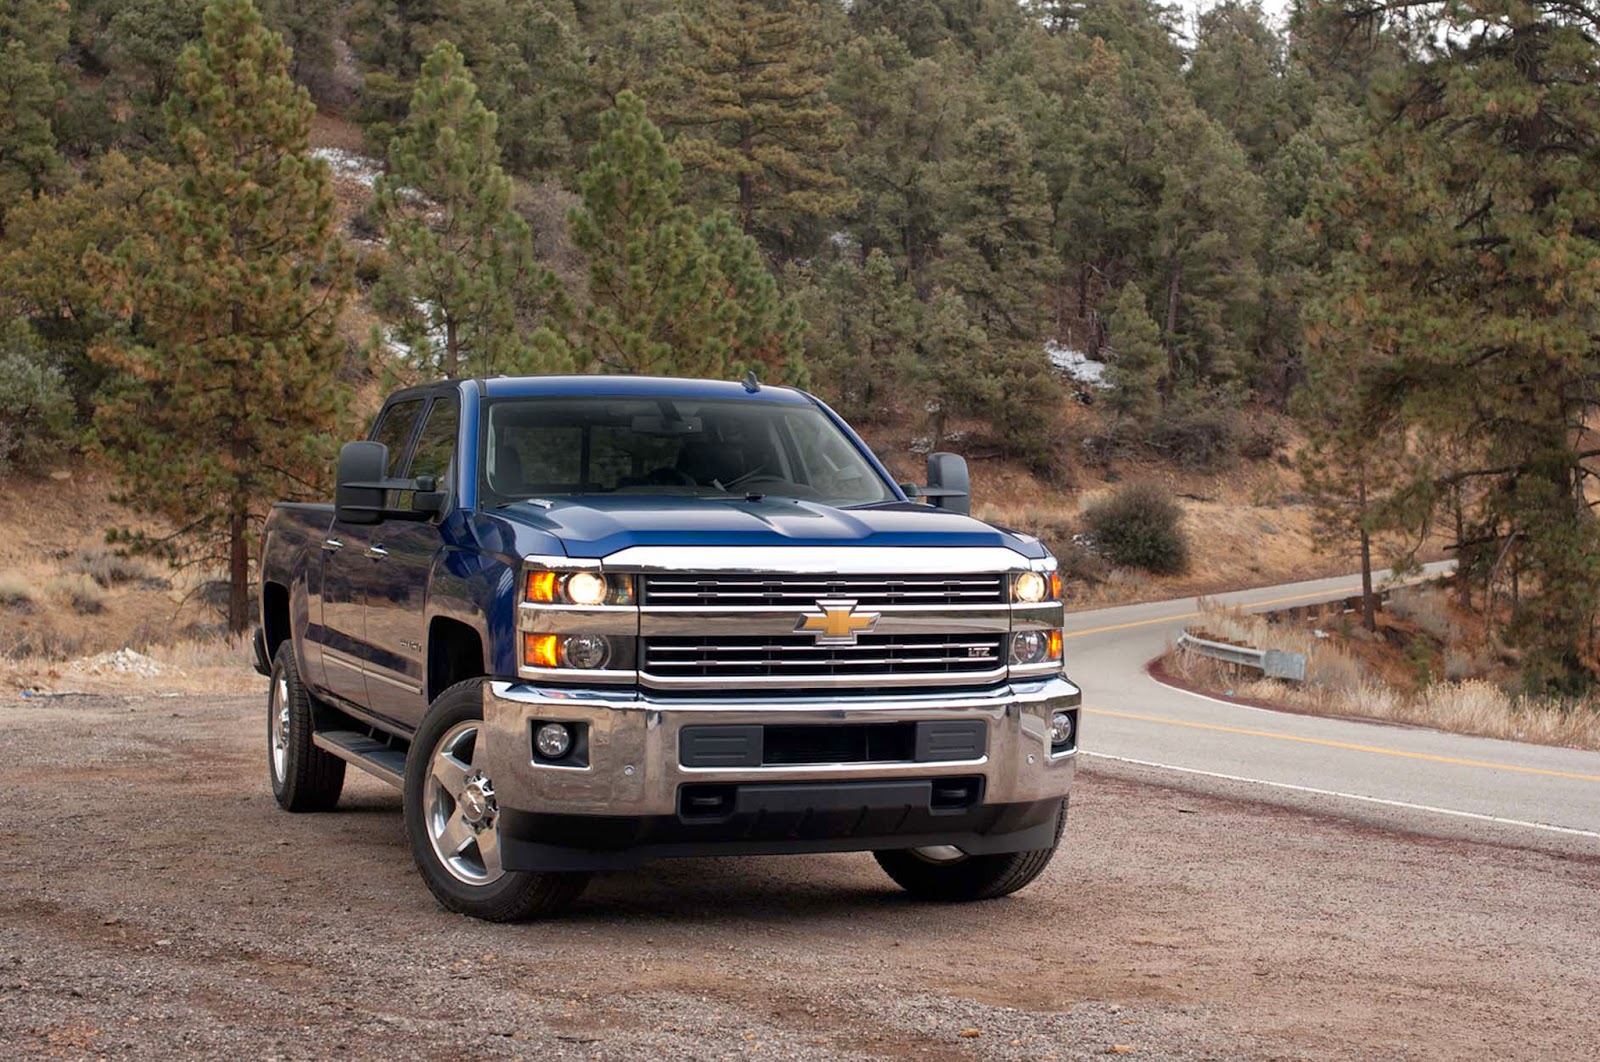 Best Full-Size Pickup Under $40,000 is Chevrolet's Silverado